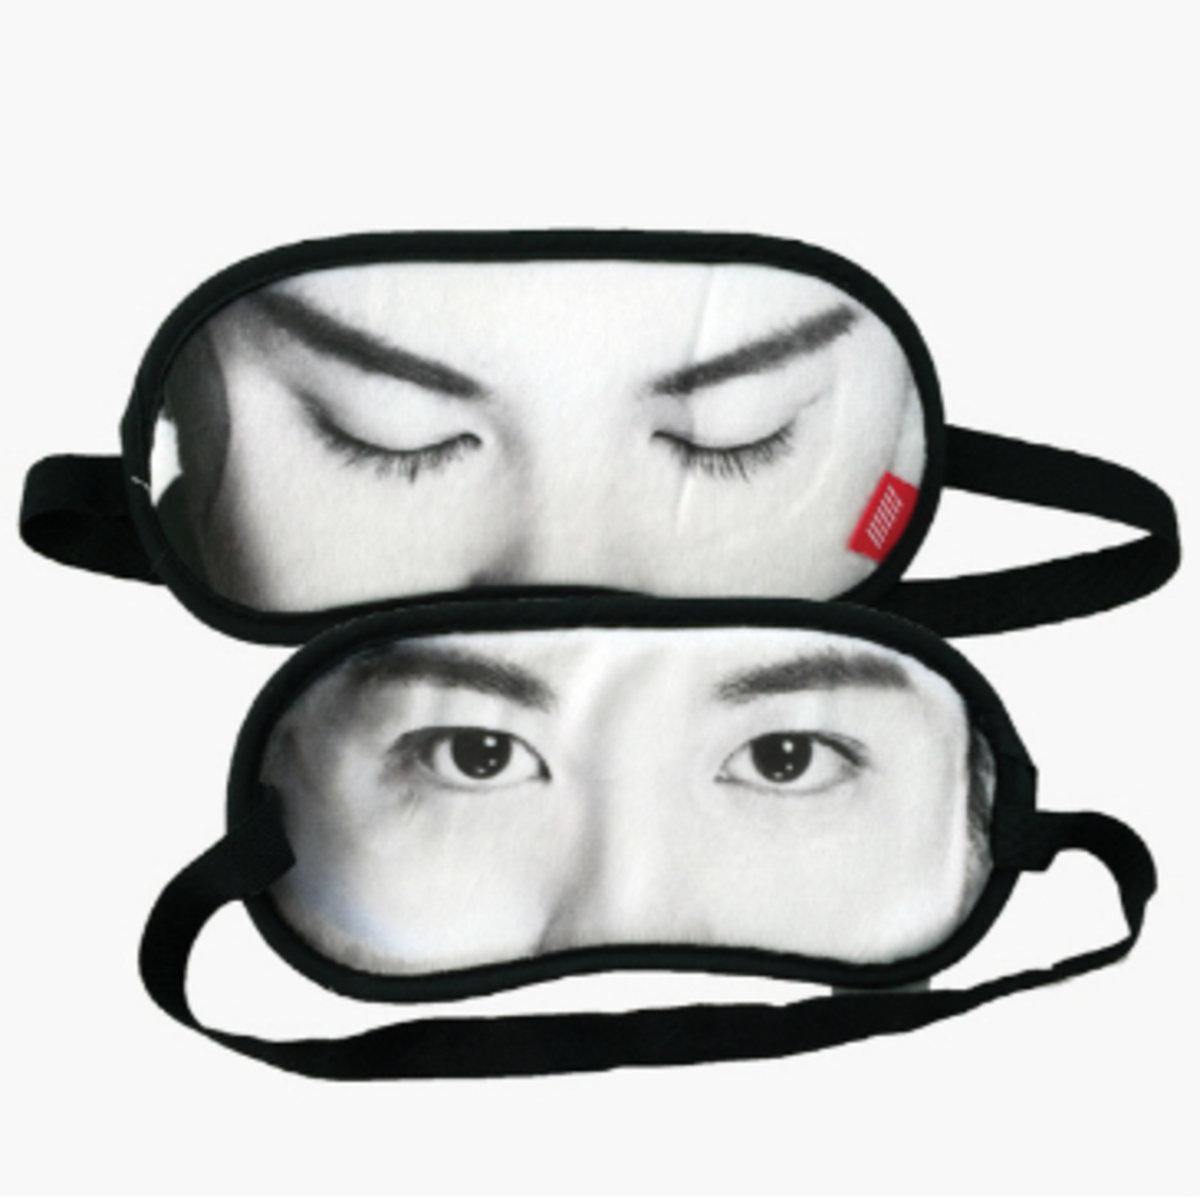 iKON - iKON 睡眠眼罩_CHANWOO [iKONCERT 2016 'SHOWTIME TOUR' MD]